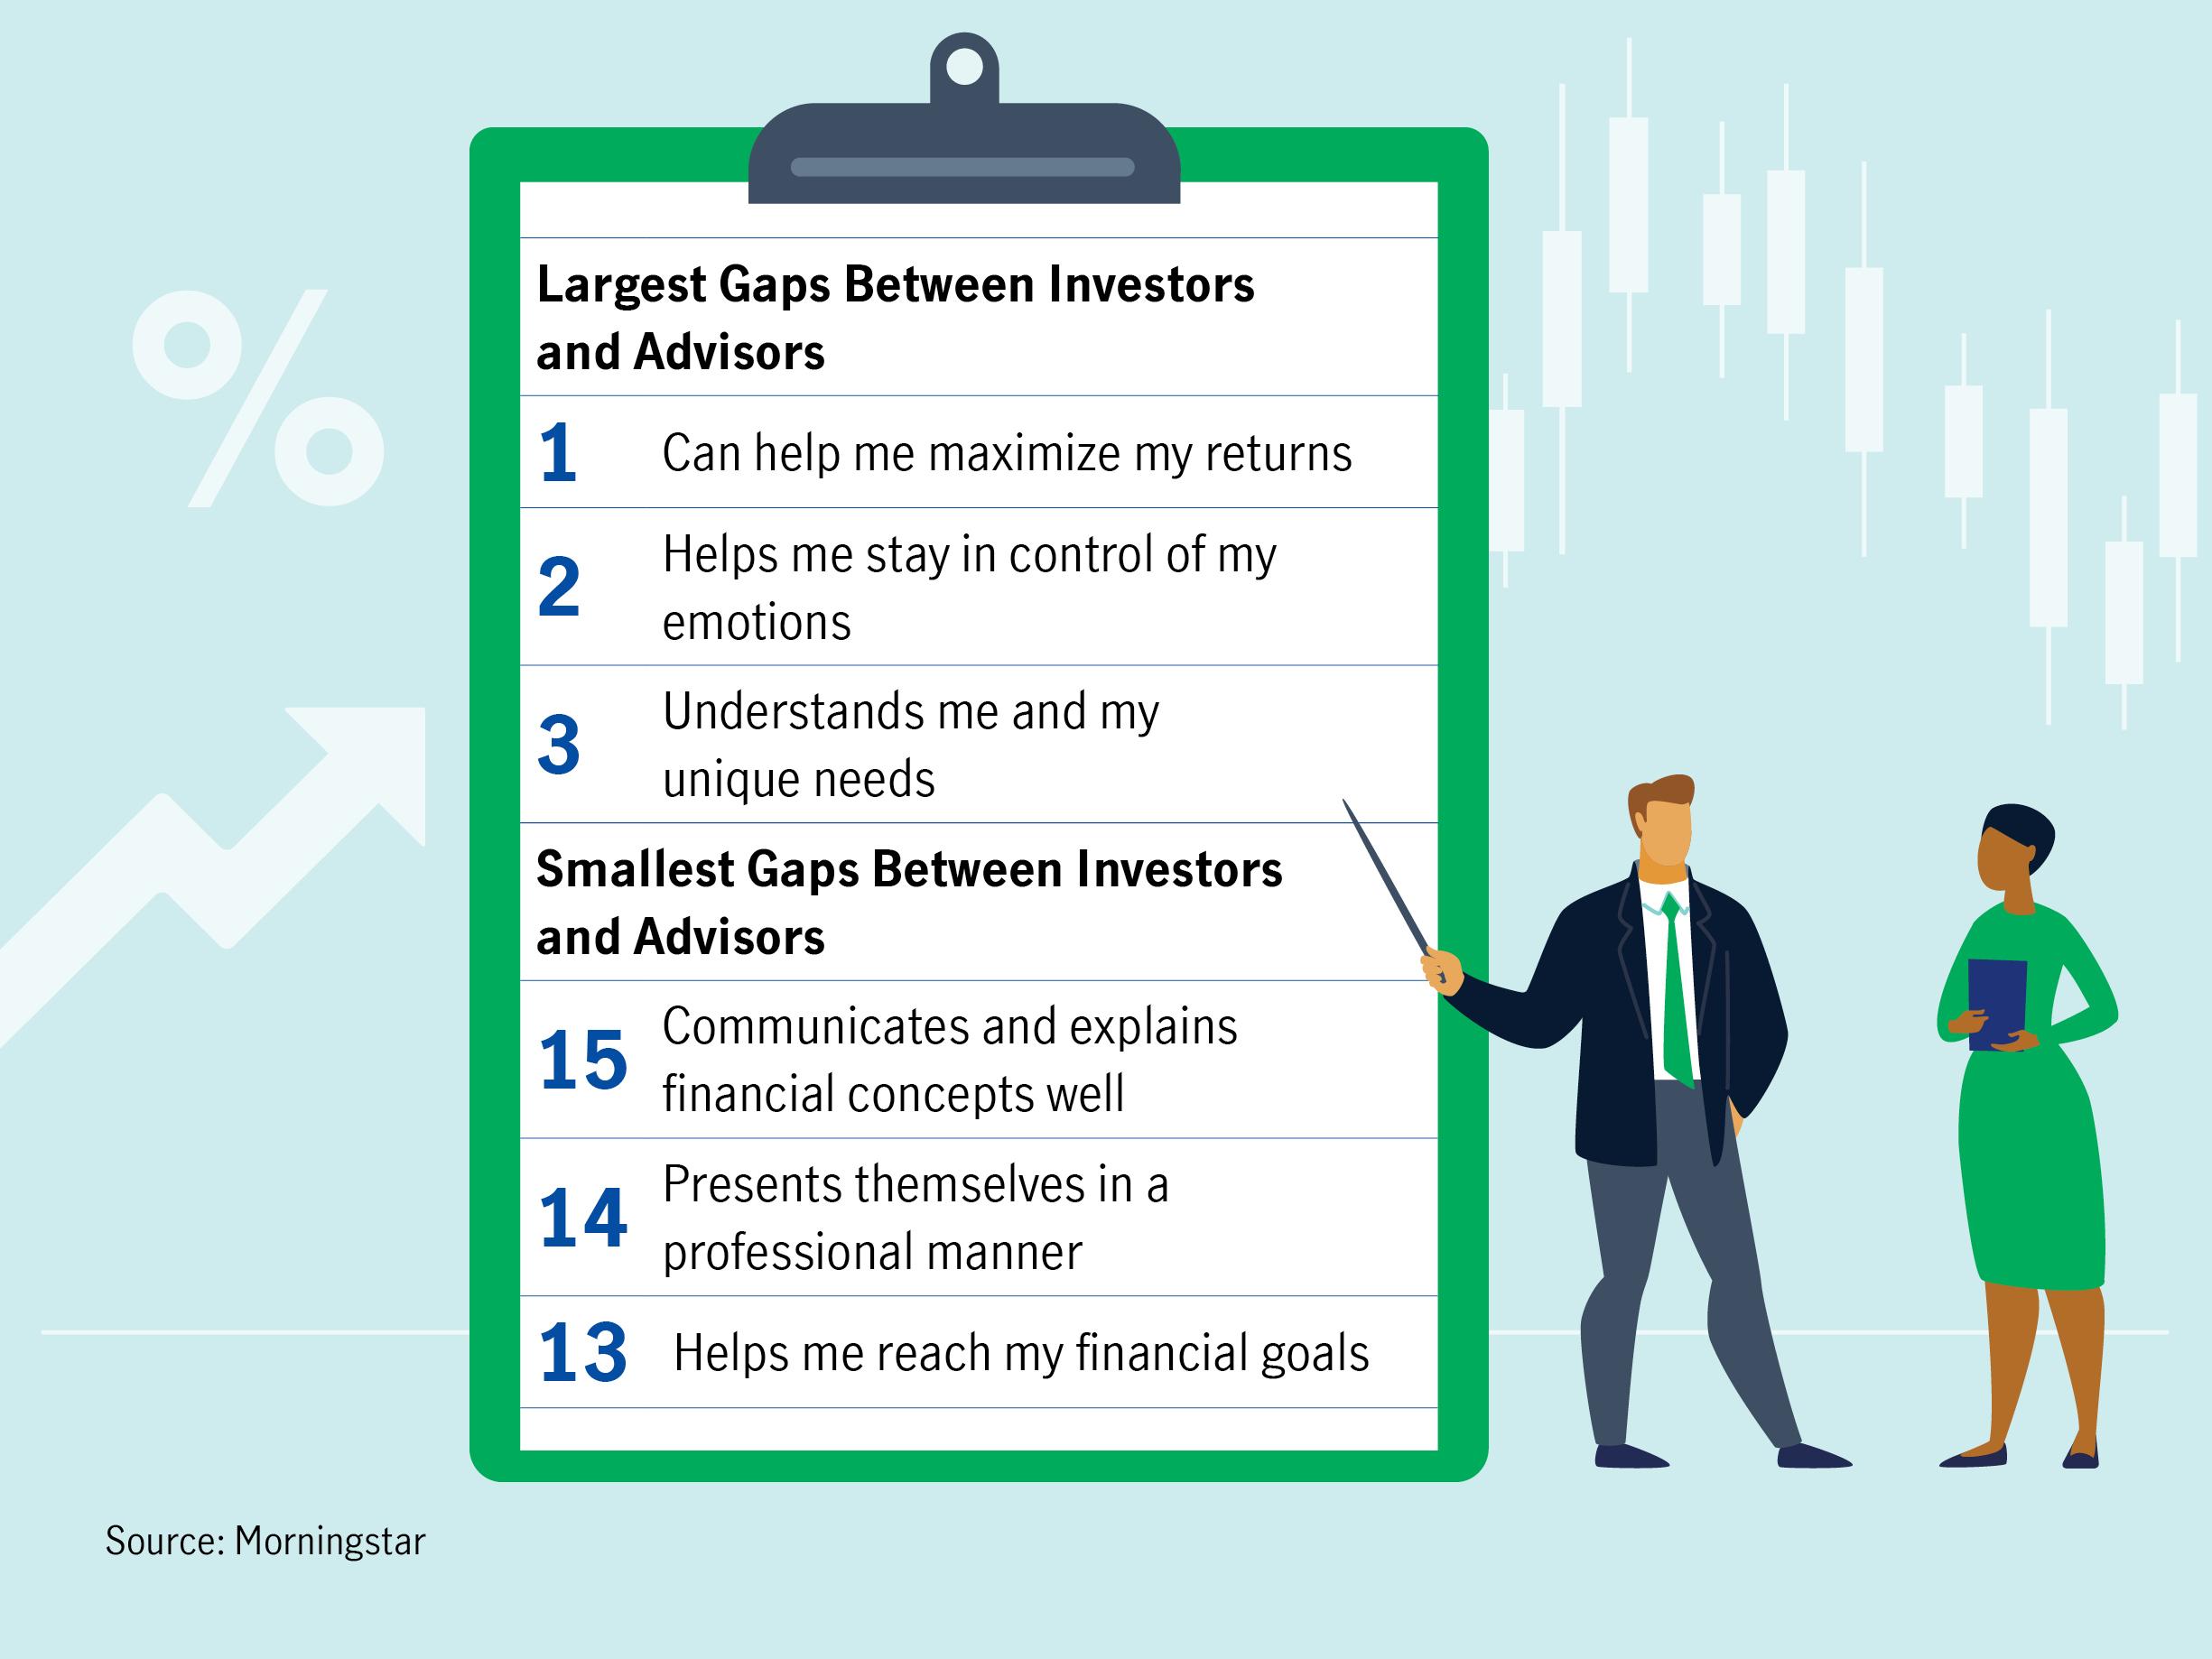 Largest gaps between investors and advisors.